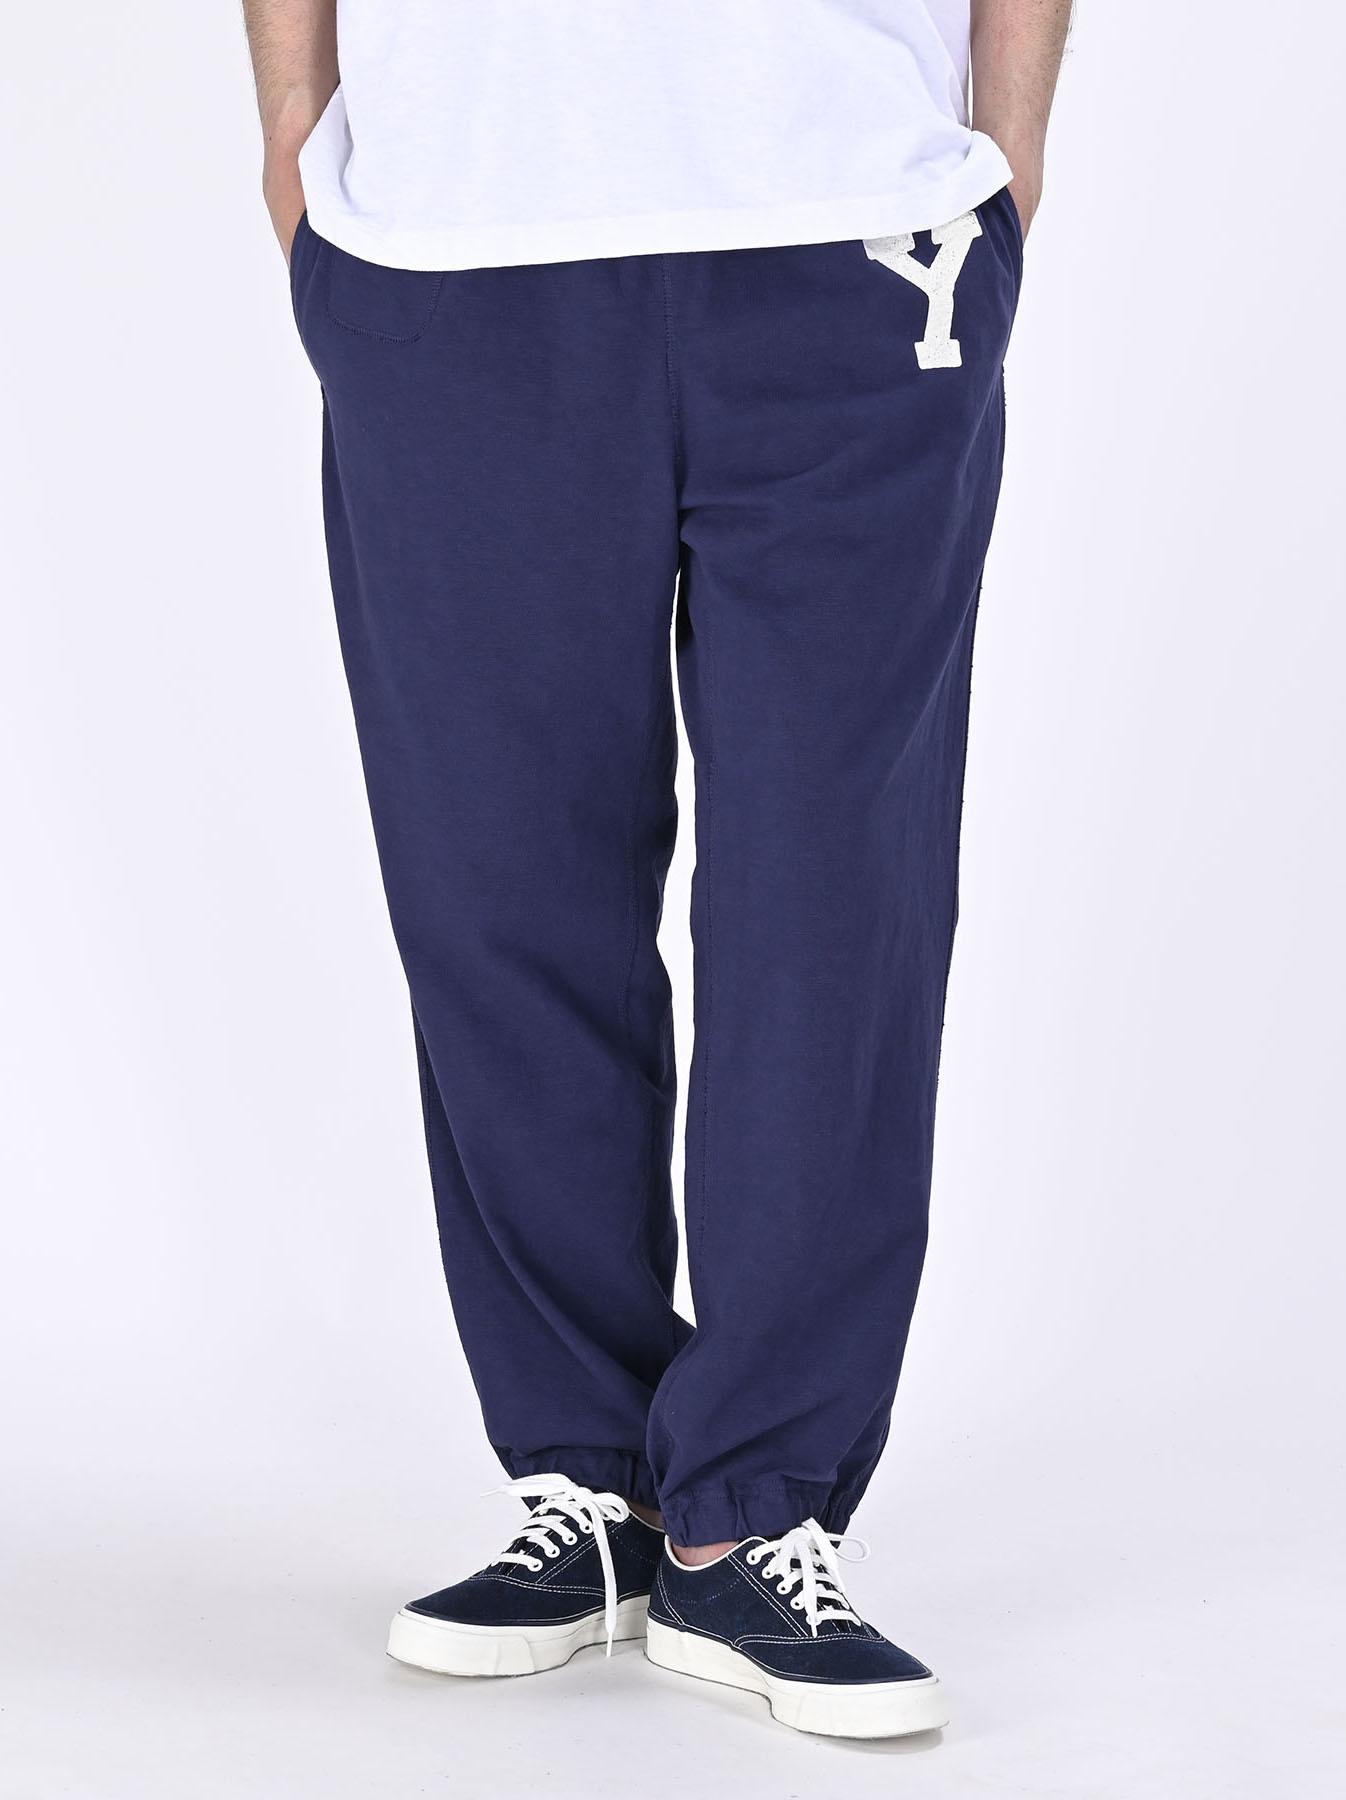 Dekoboko Tenjiku Regatta Pants (0621)-5